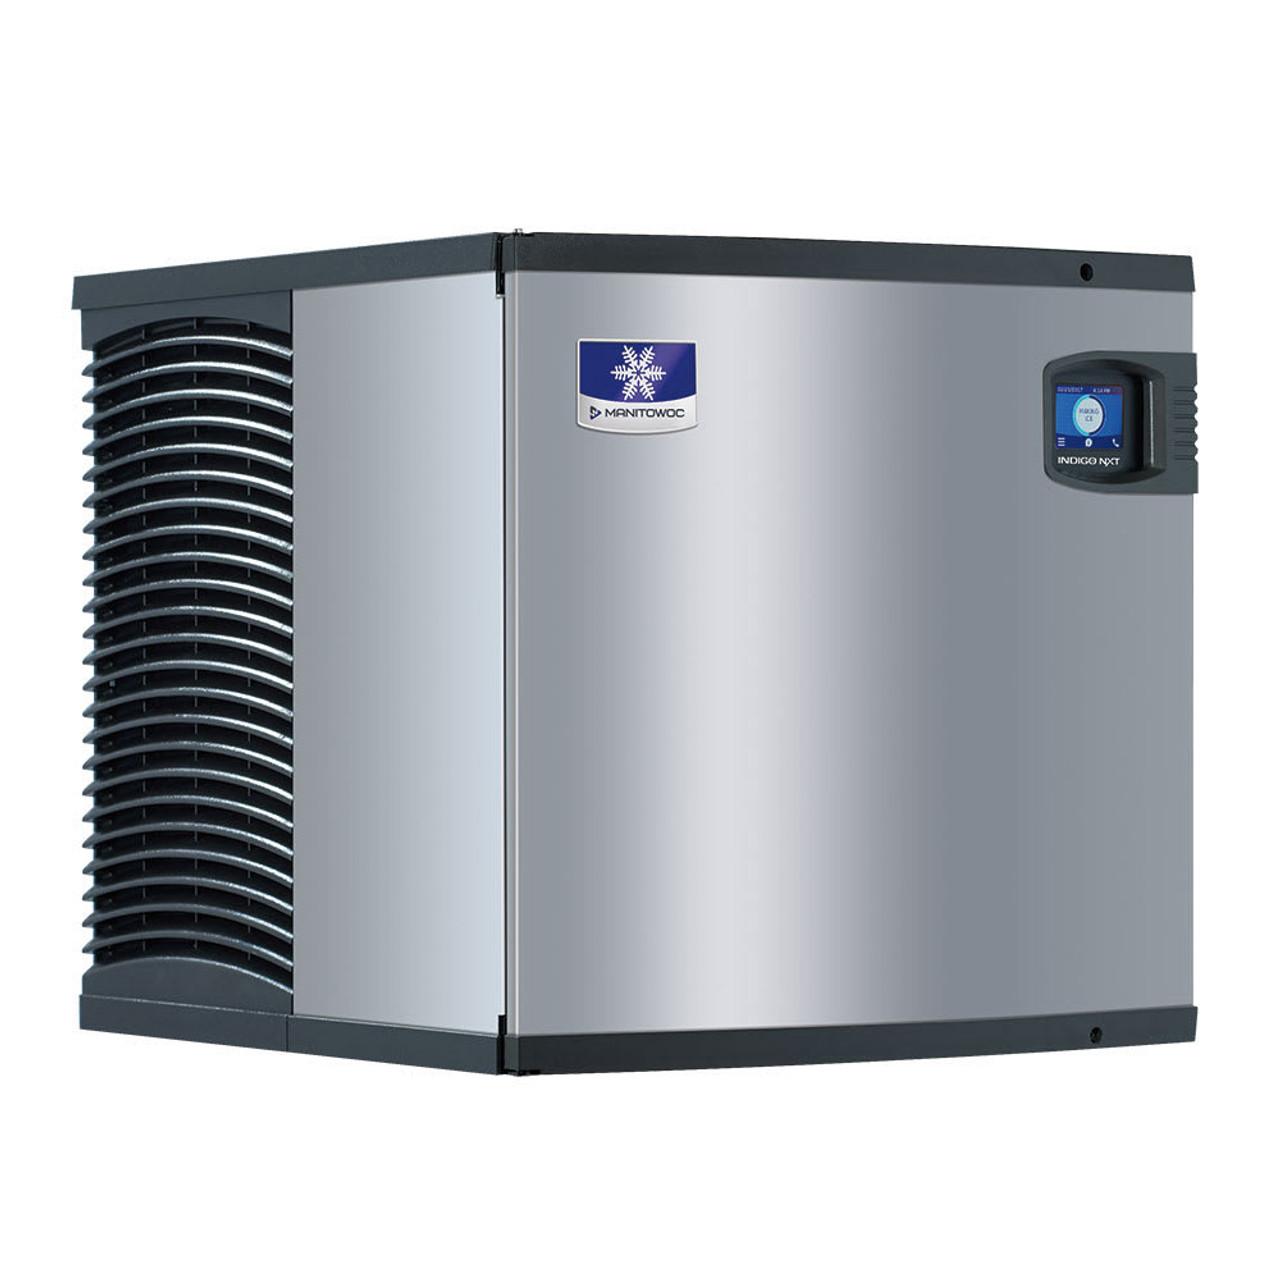 Manitowoc IYT0620A-161 Air Cooled Half Cube Ice Machine Head, 575 lbs, on